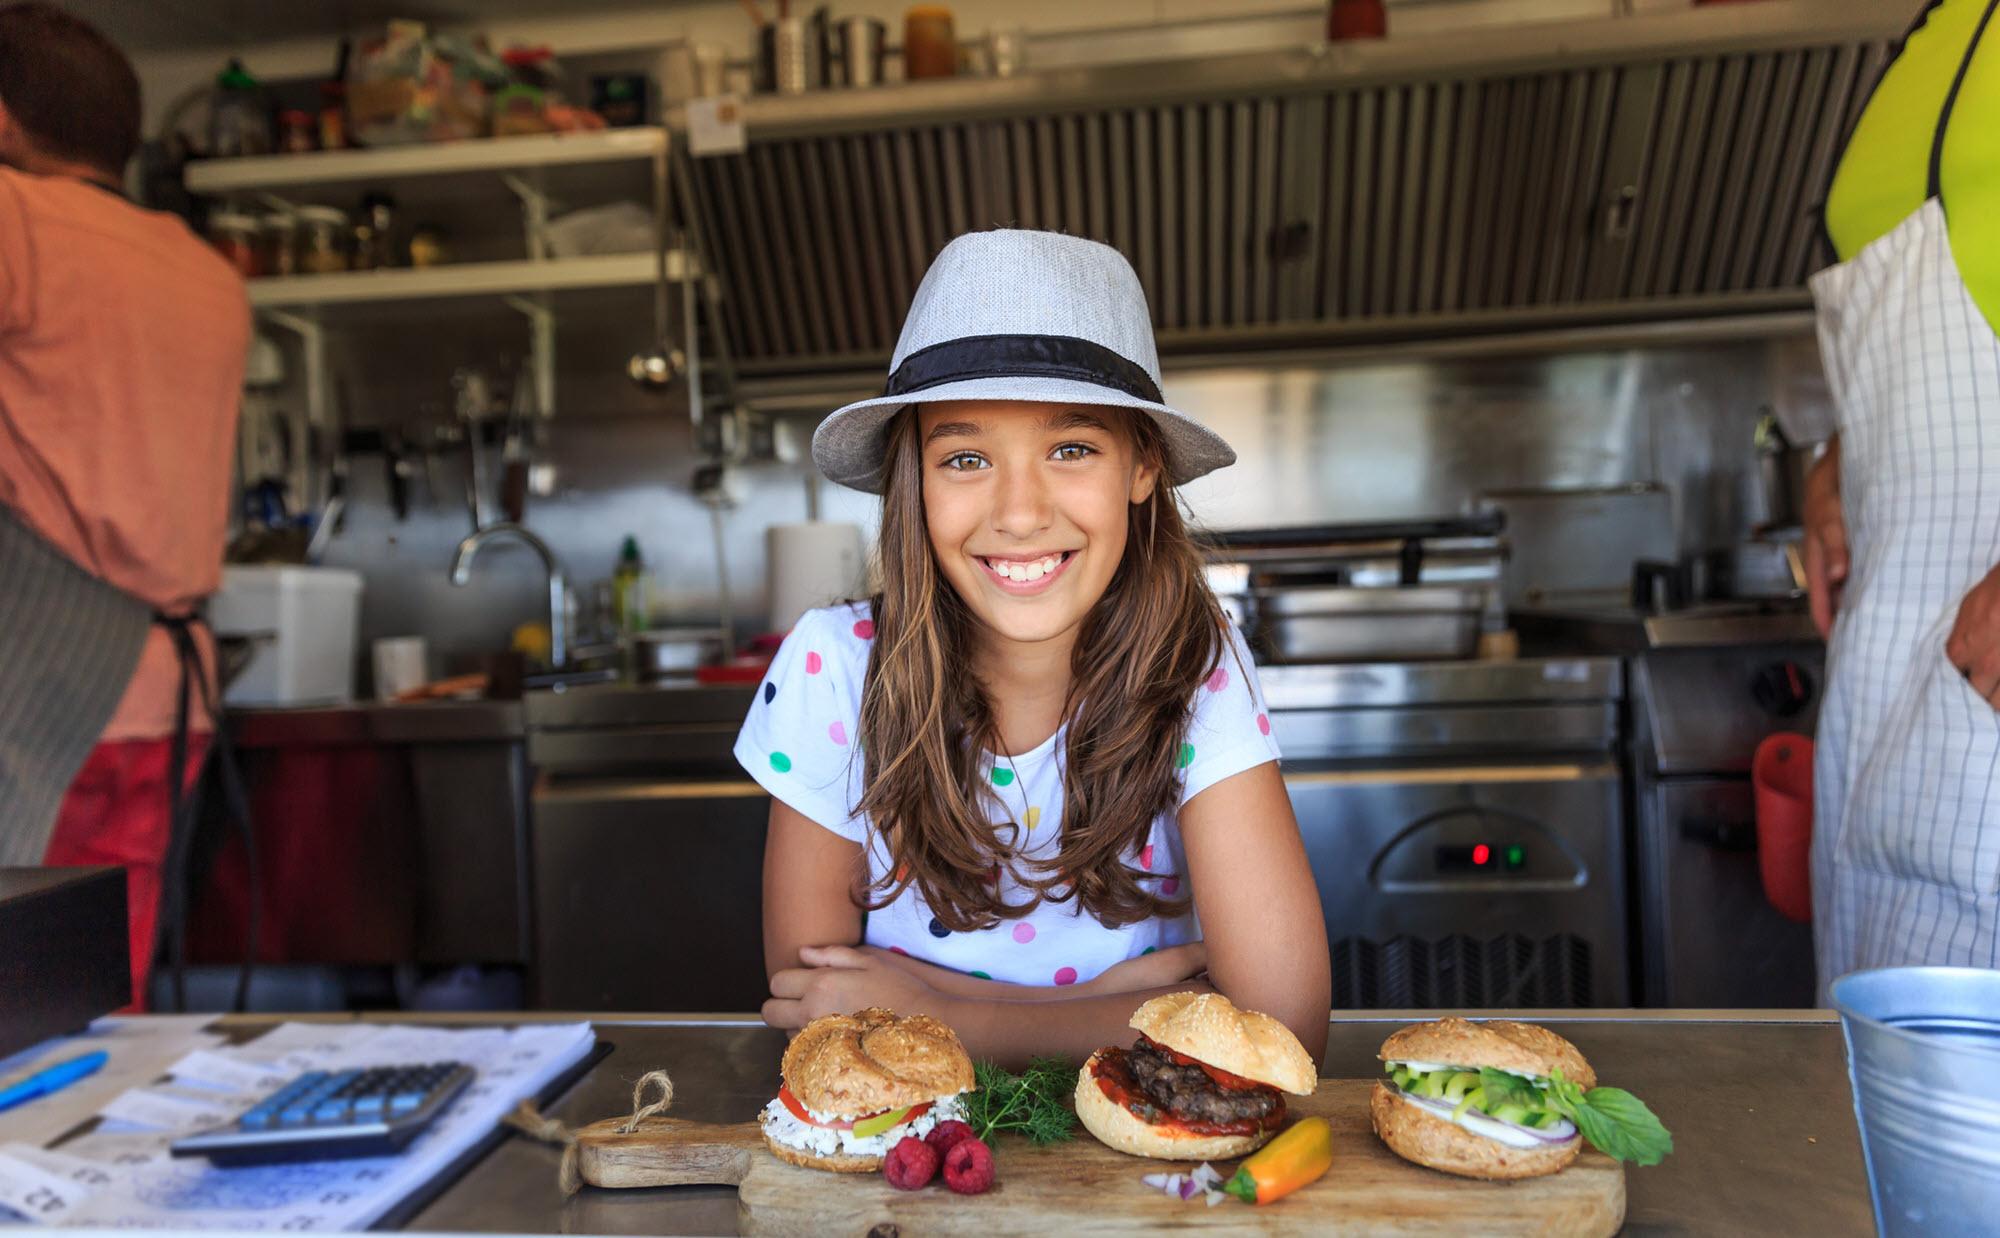 girl entrepreneur in a kitchen